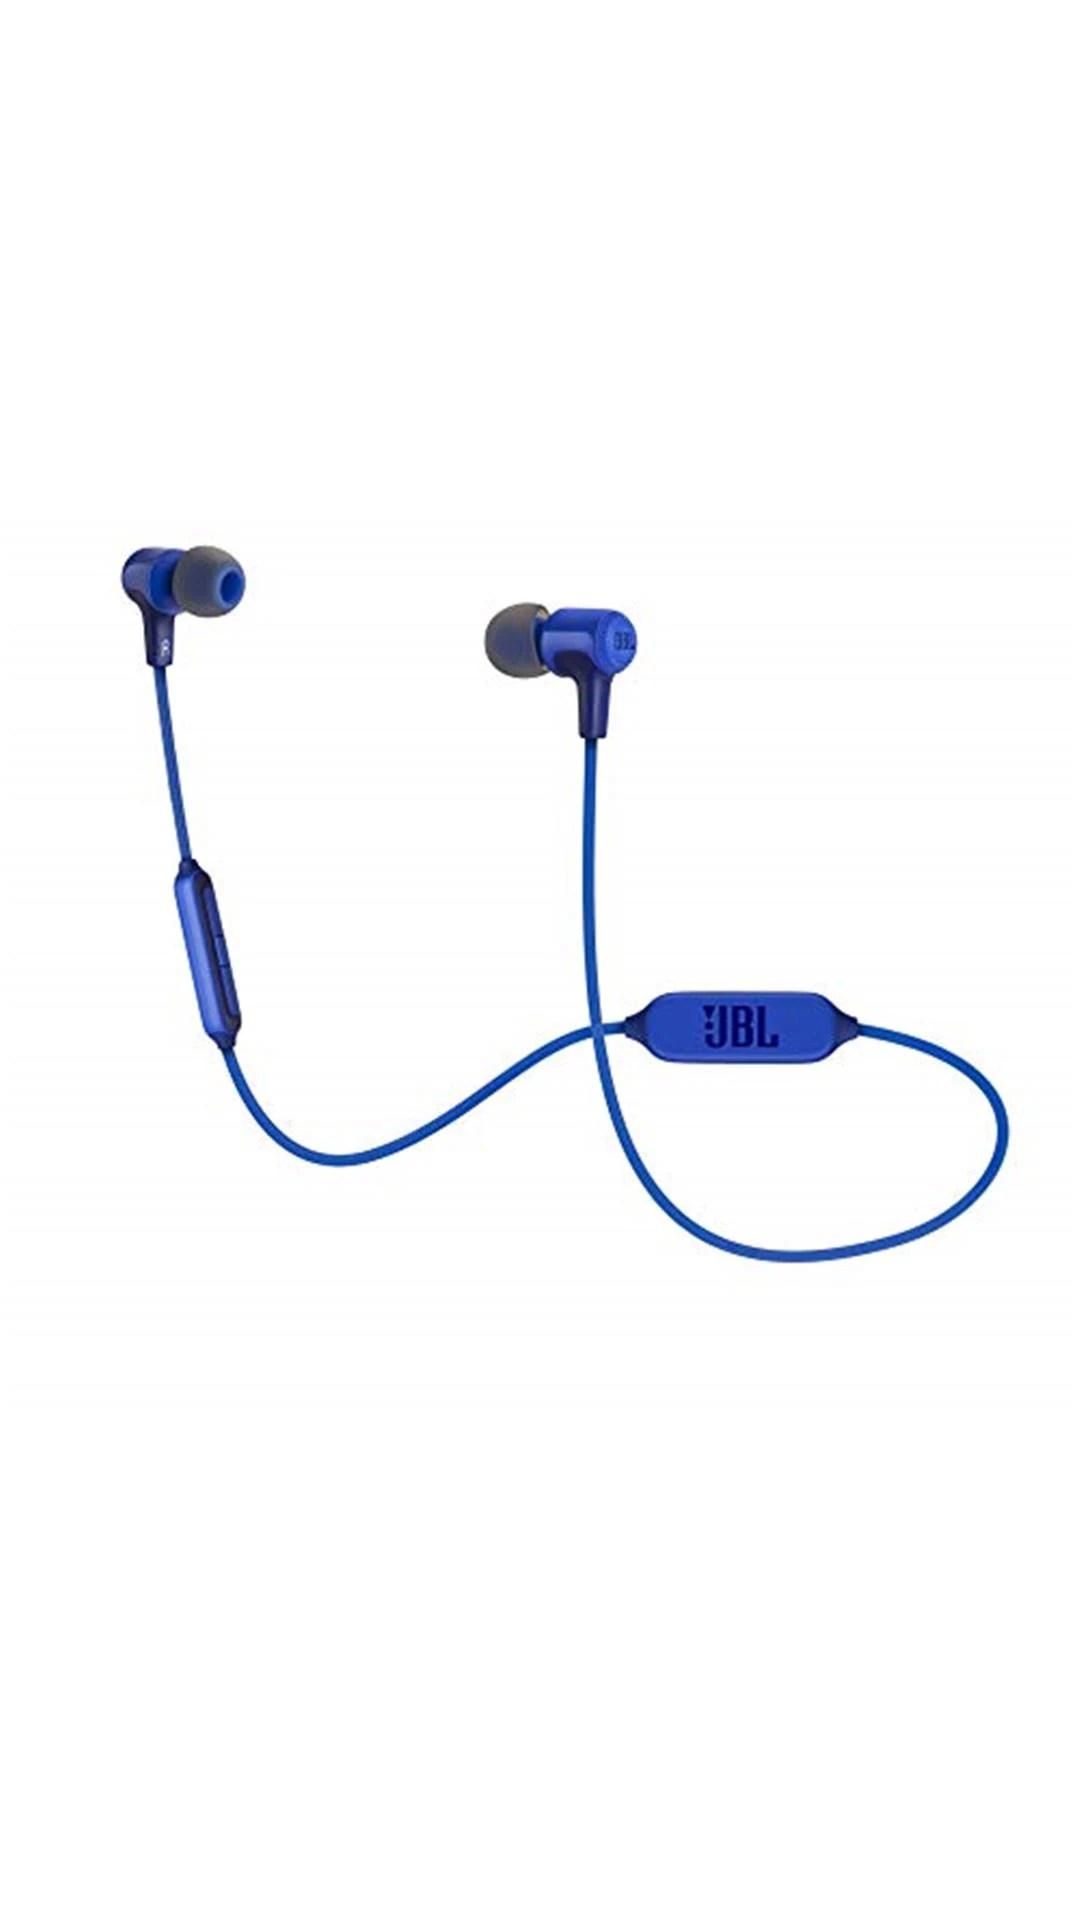 headphone jack sizes chart jbl headset mic wiring diagram wiring diagram priv on apple headphone wiring diagram  [ 1080 x 1920 Pixel ]